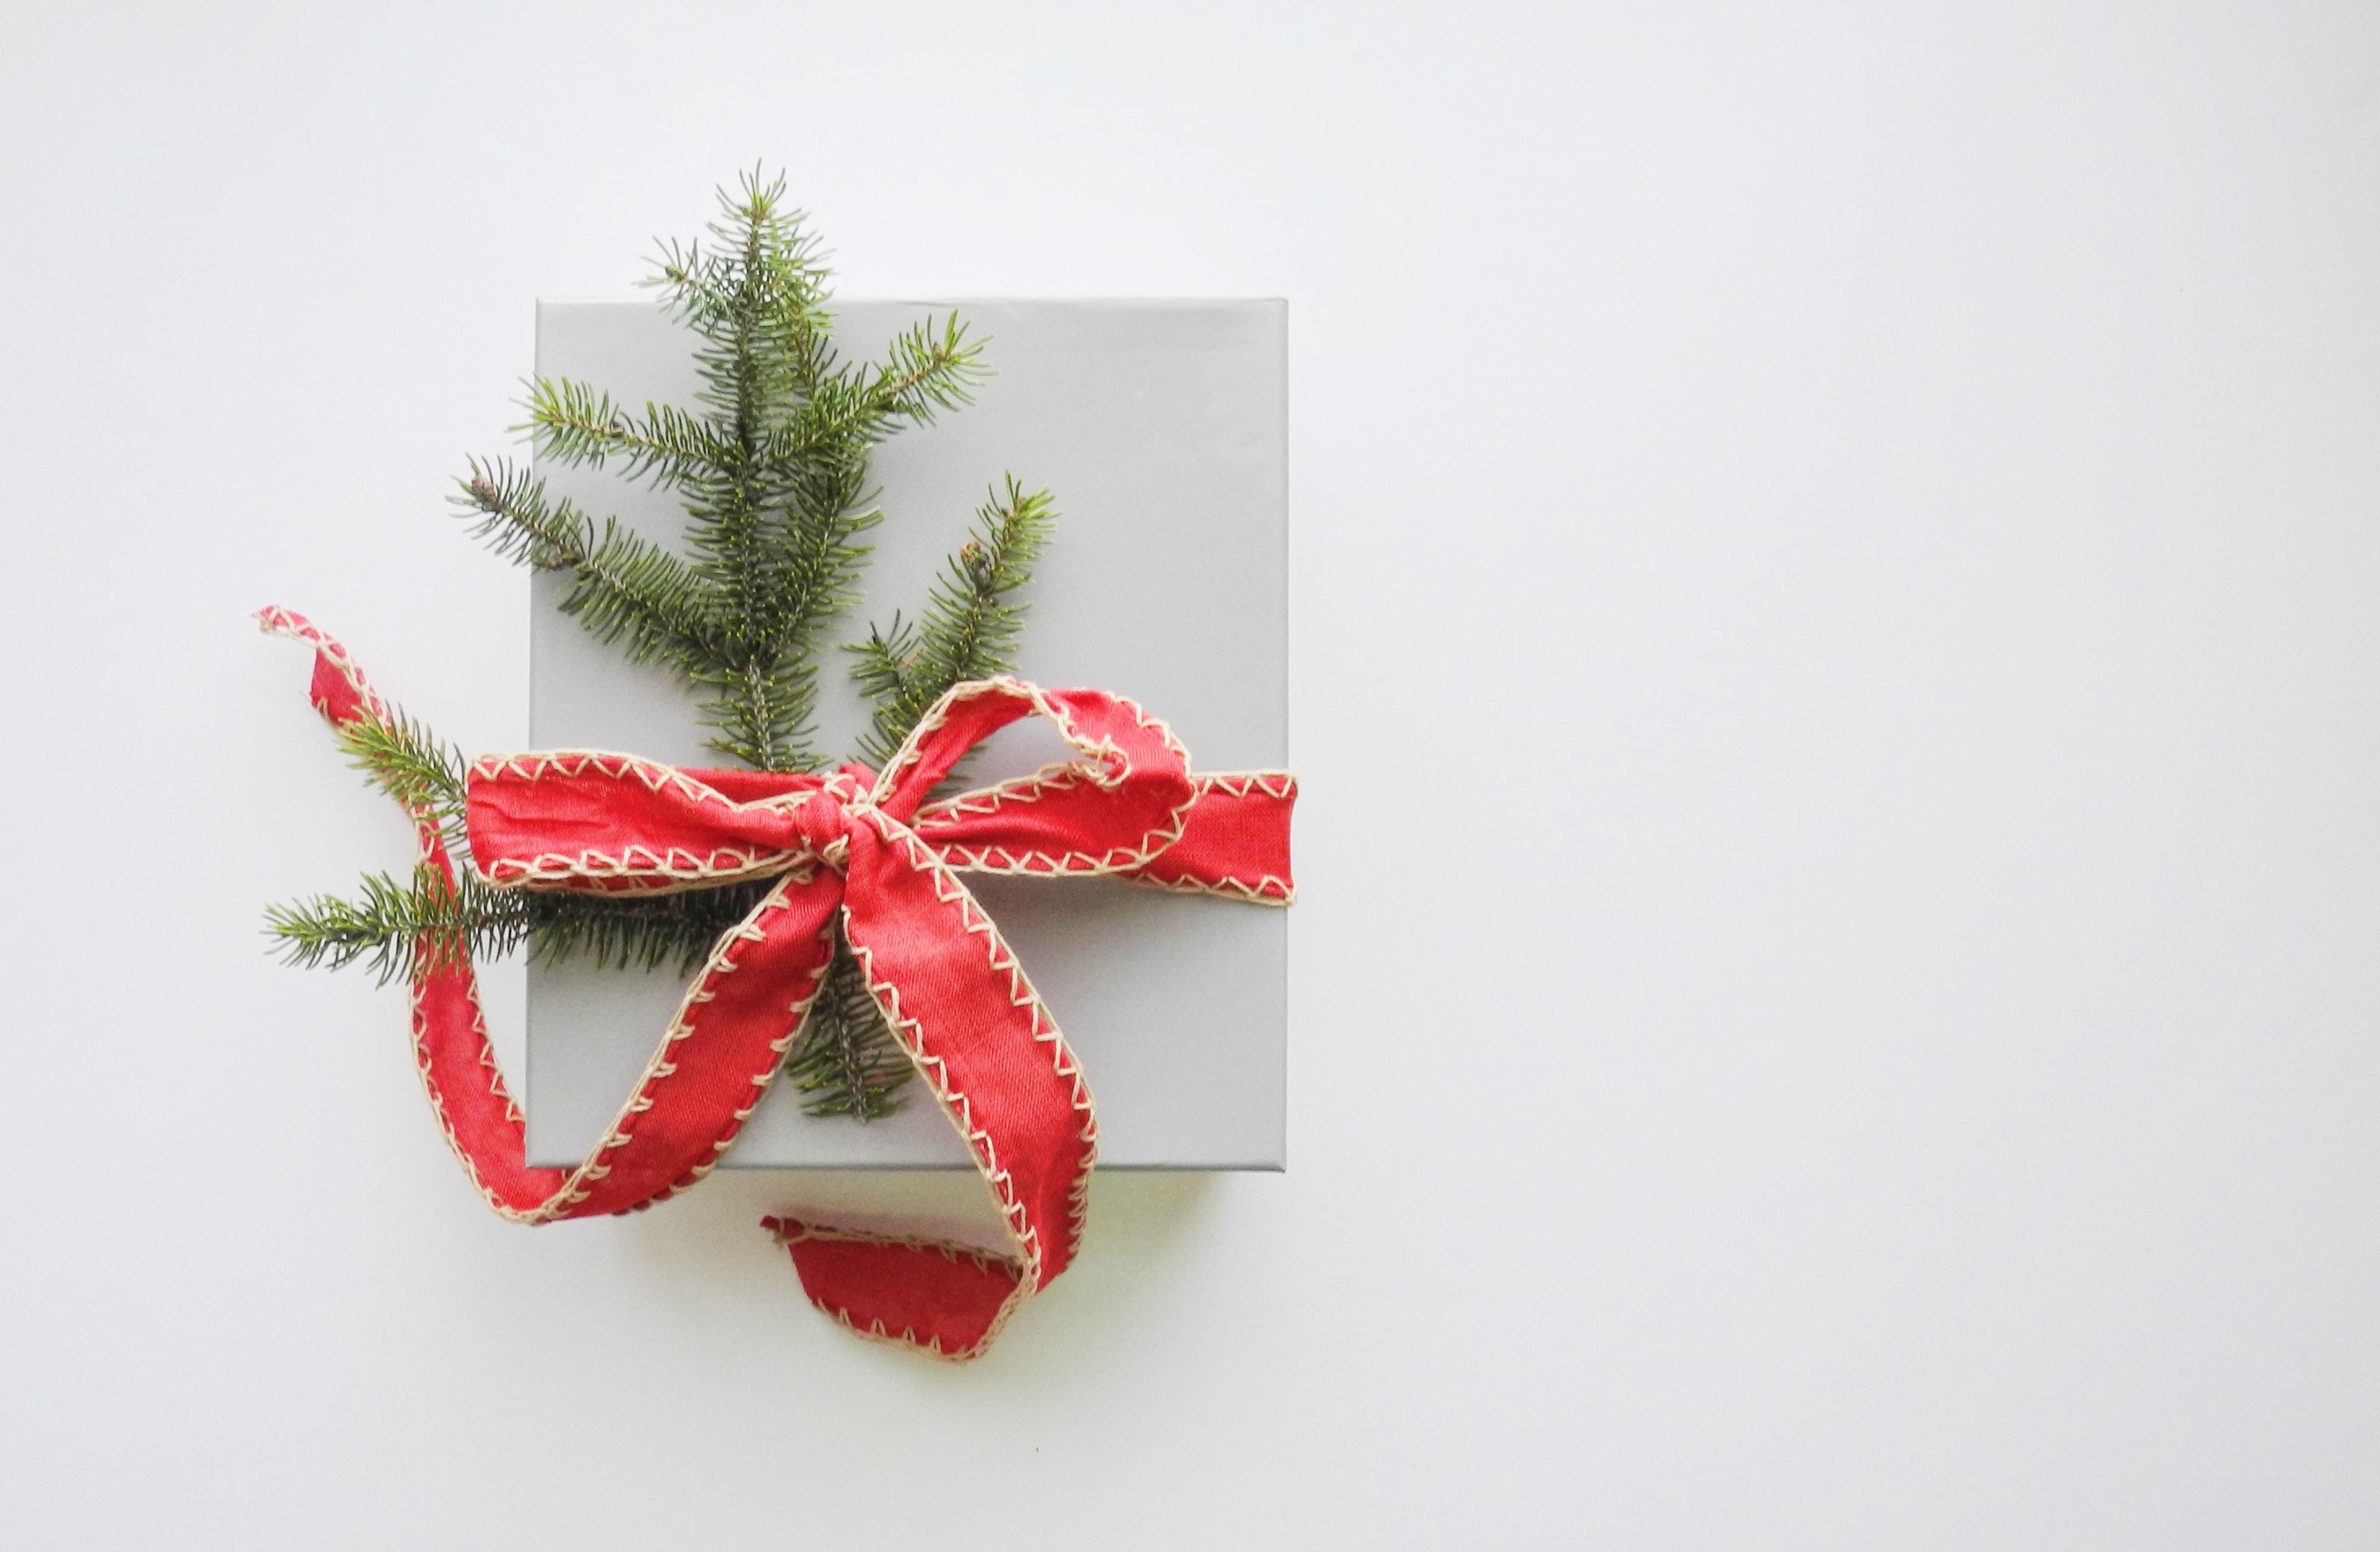 cadeau de Noël fond blanc